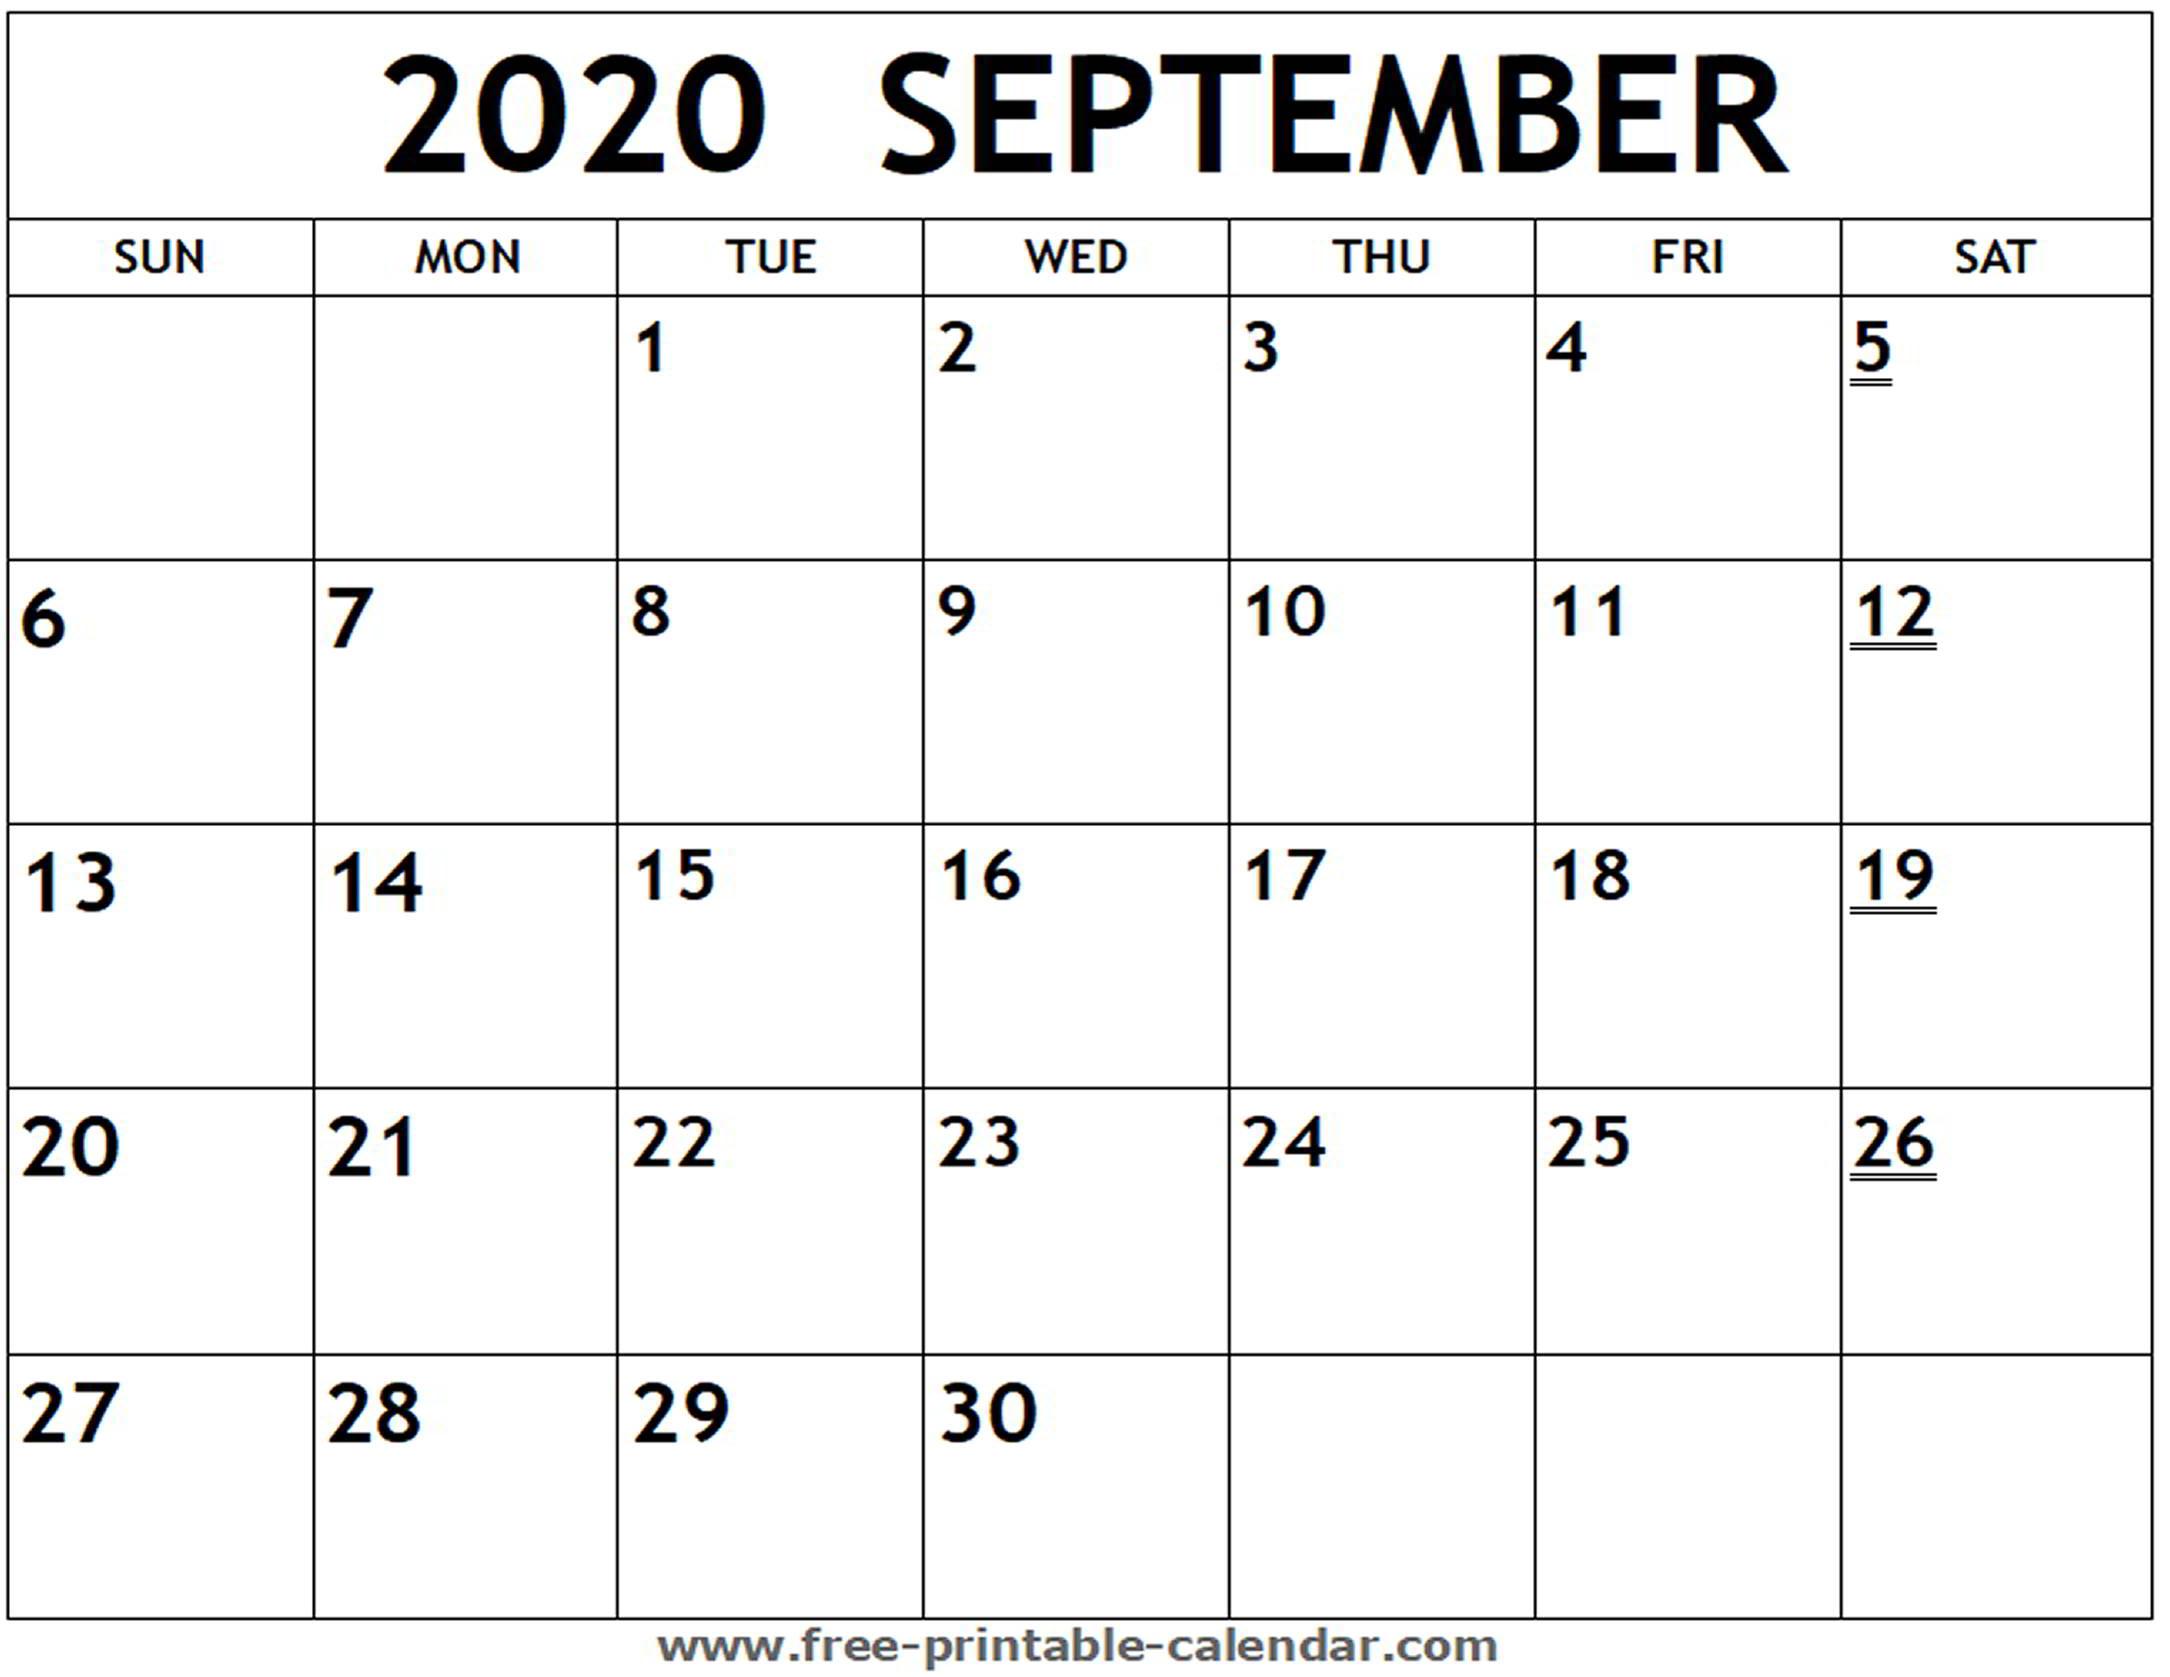 Printable 2020 September Calendar - Free-Printable-Calendar